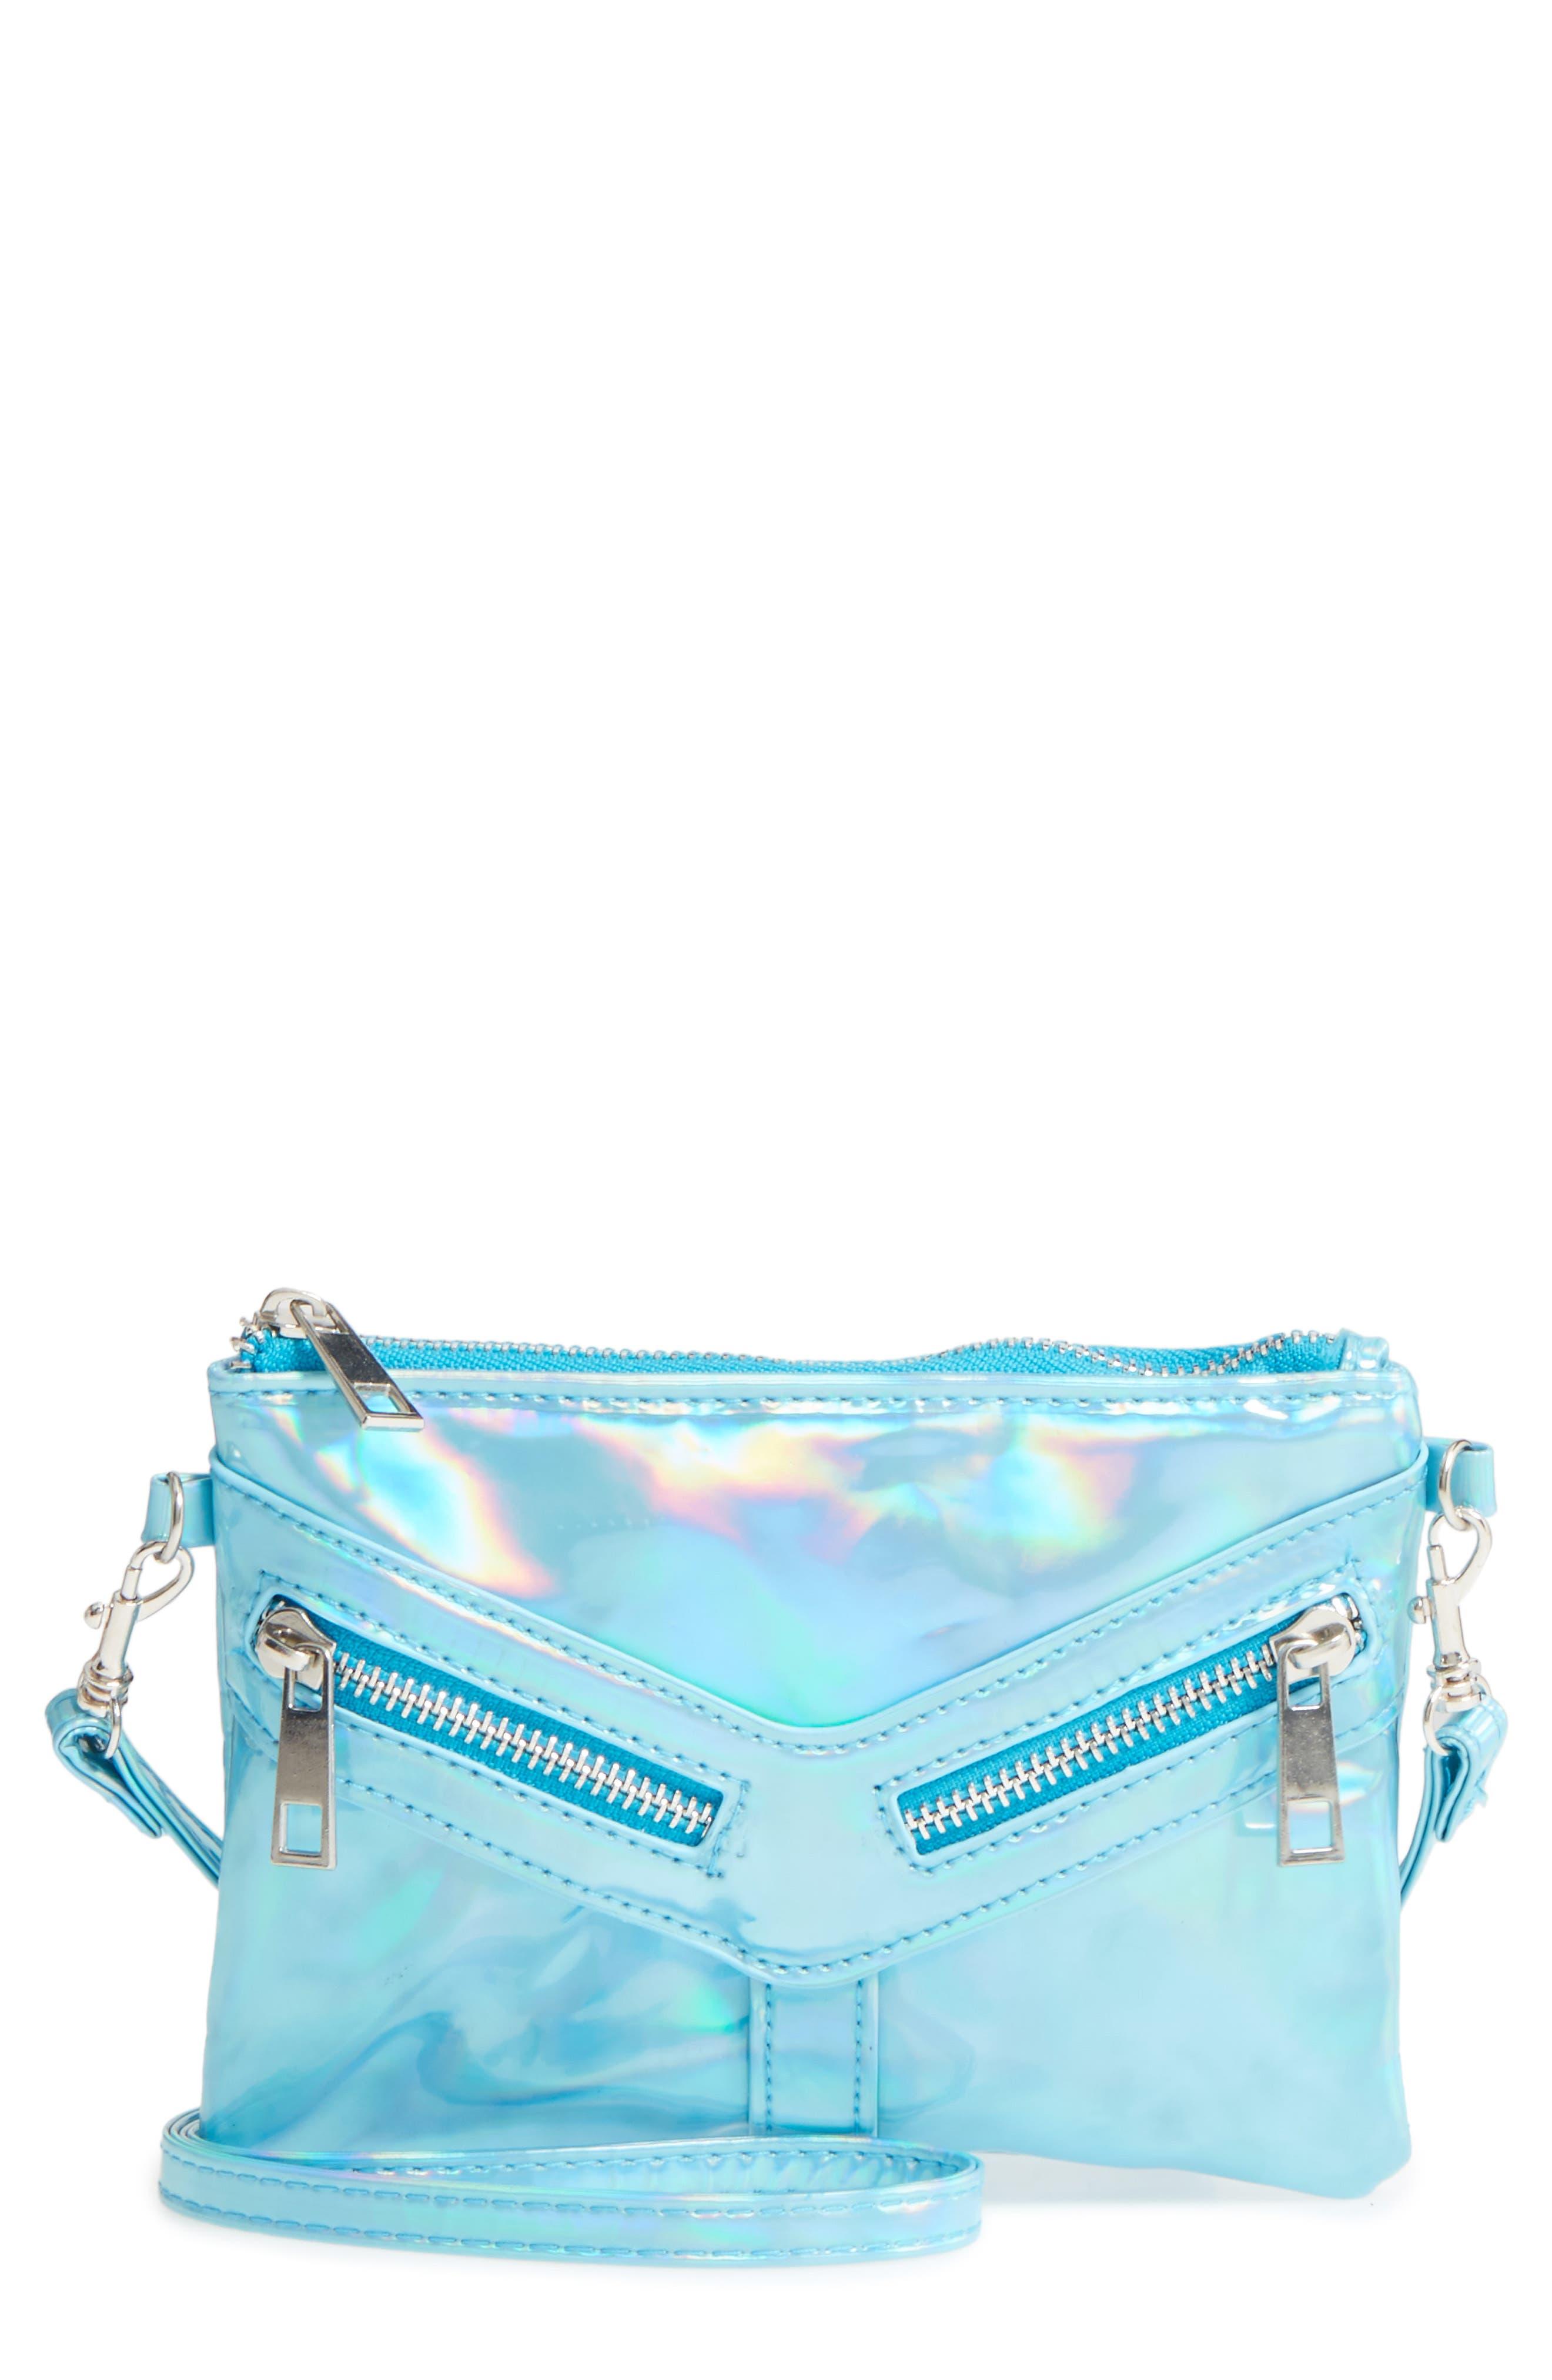 Capelli of New York Hologram Crossbody Bag,                         Main,                         color, 401